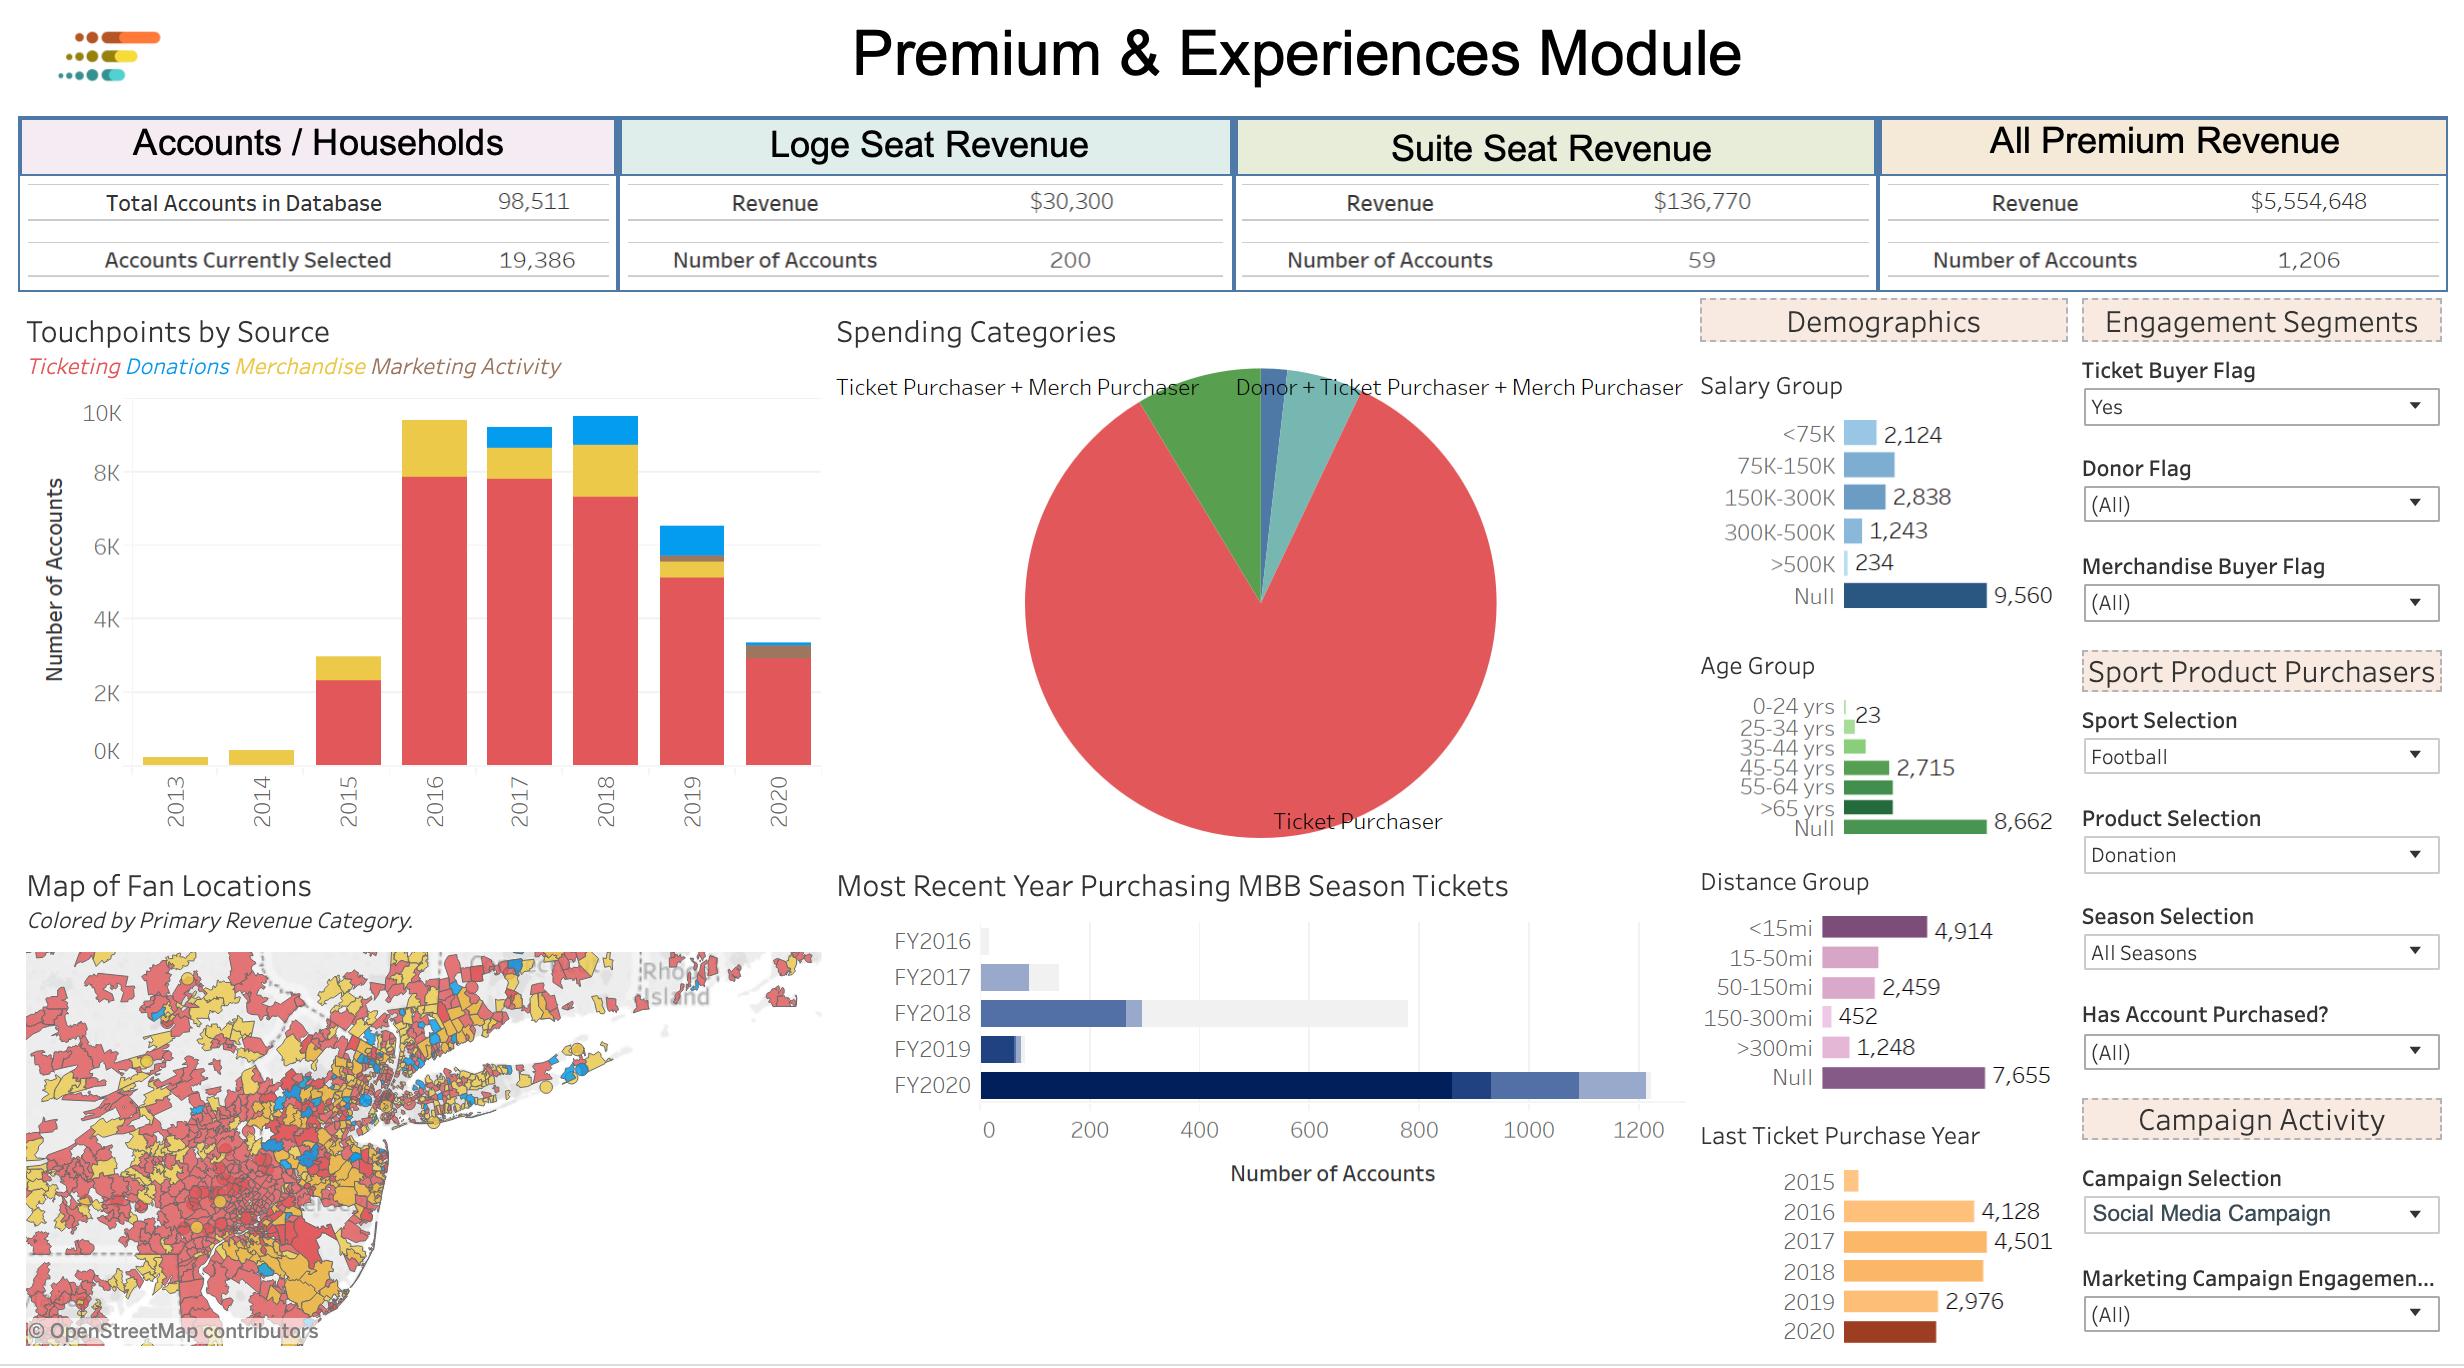 PremiumModules-1